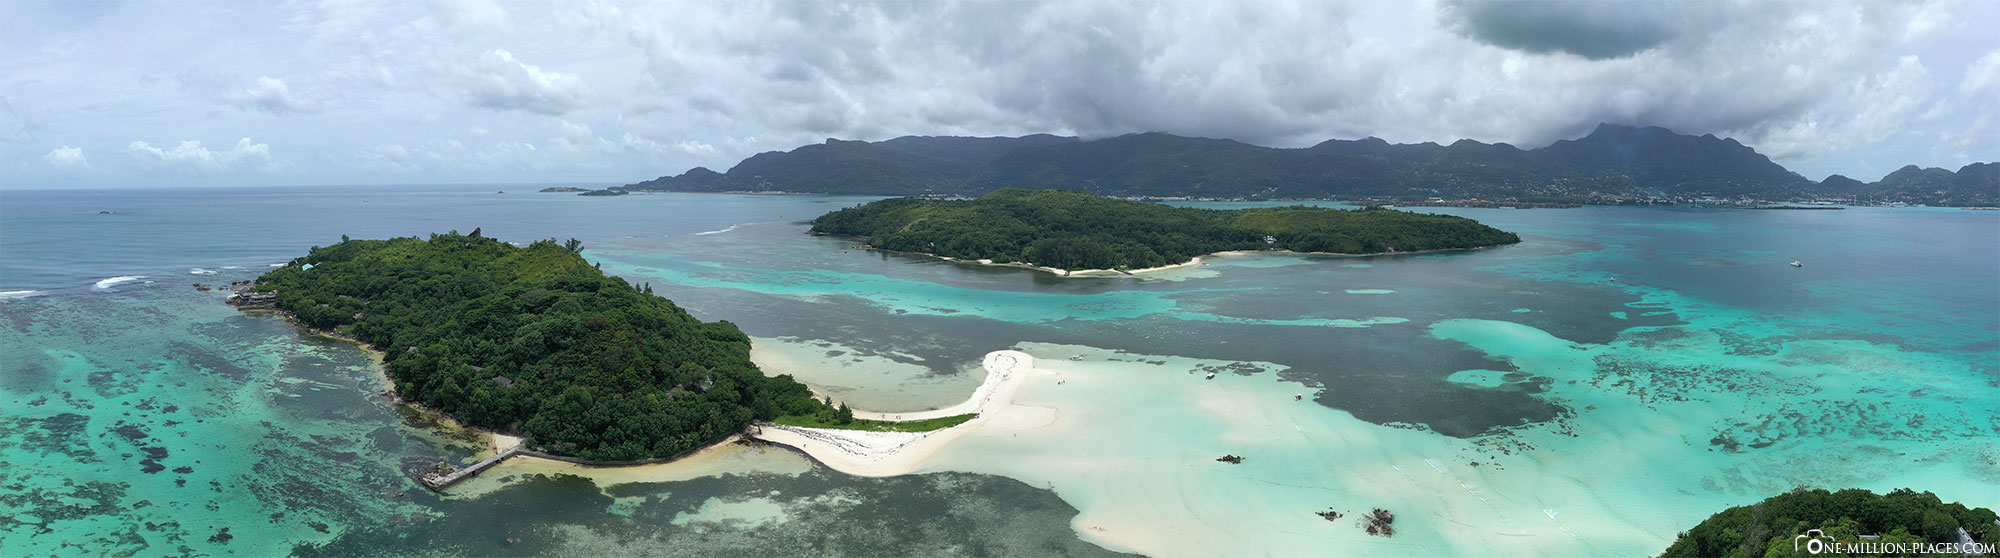 Panoramabild, Sainte Anne Marine National Park , Mahé, Seychellen, Drohnenaufnahme, Tour, Reisebericht